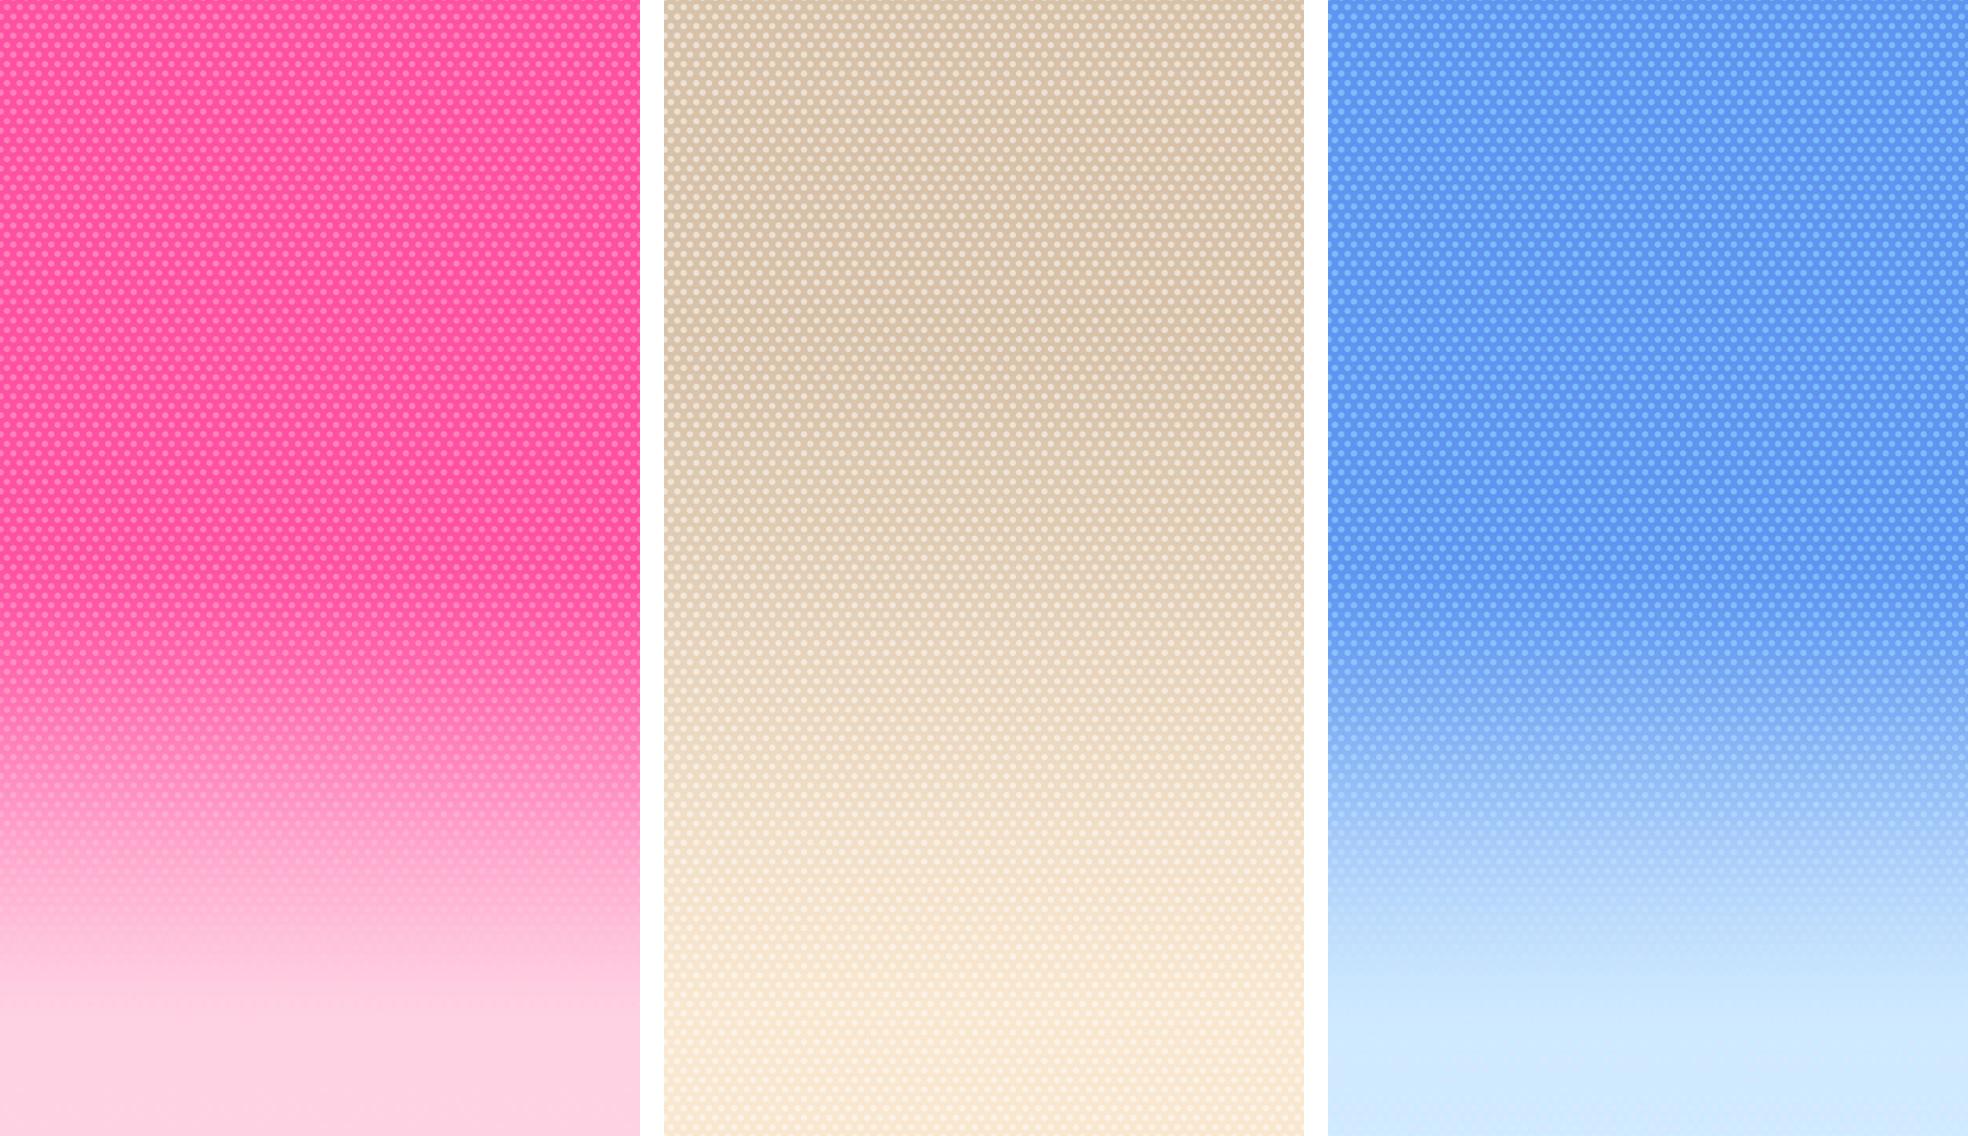 61 Ipod Wallpaper Downloads On Wallpapersafari